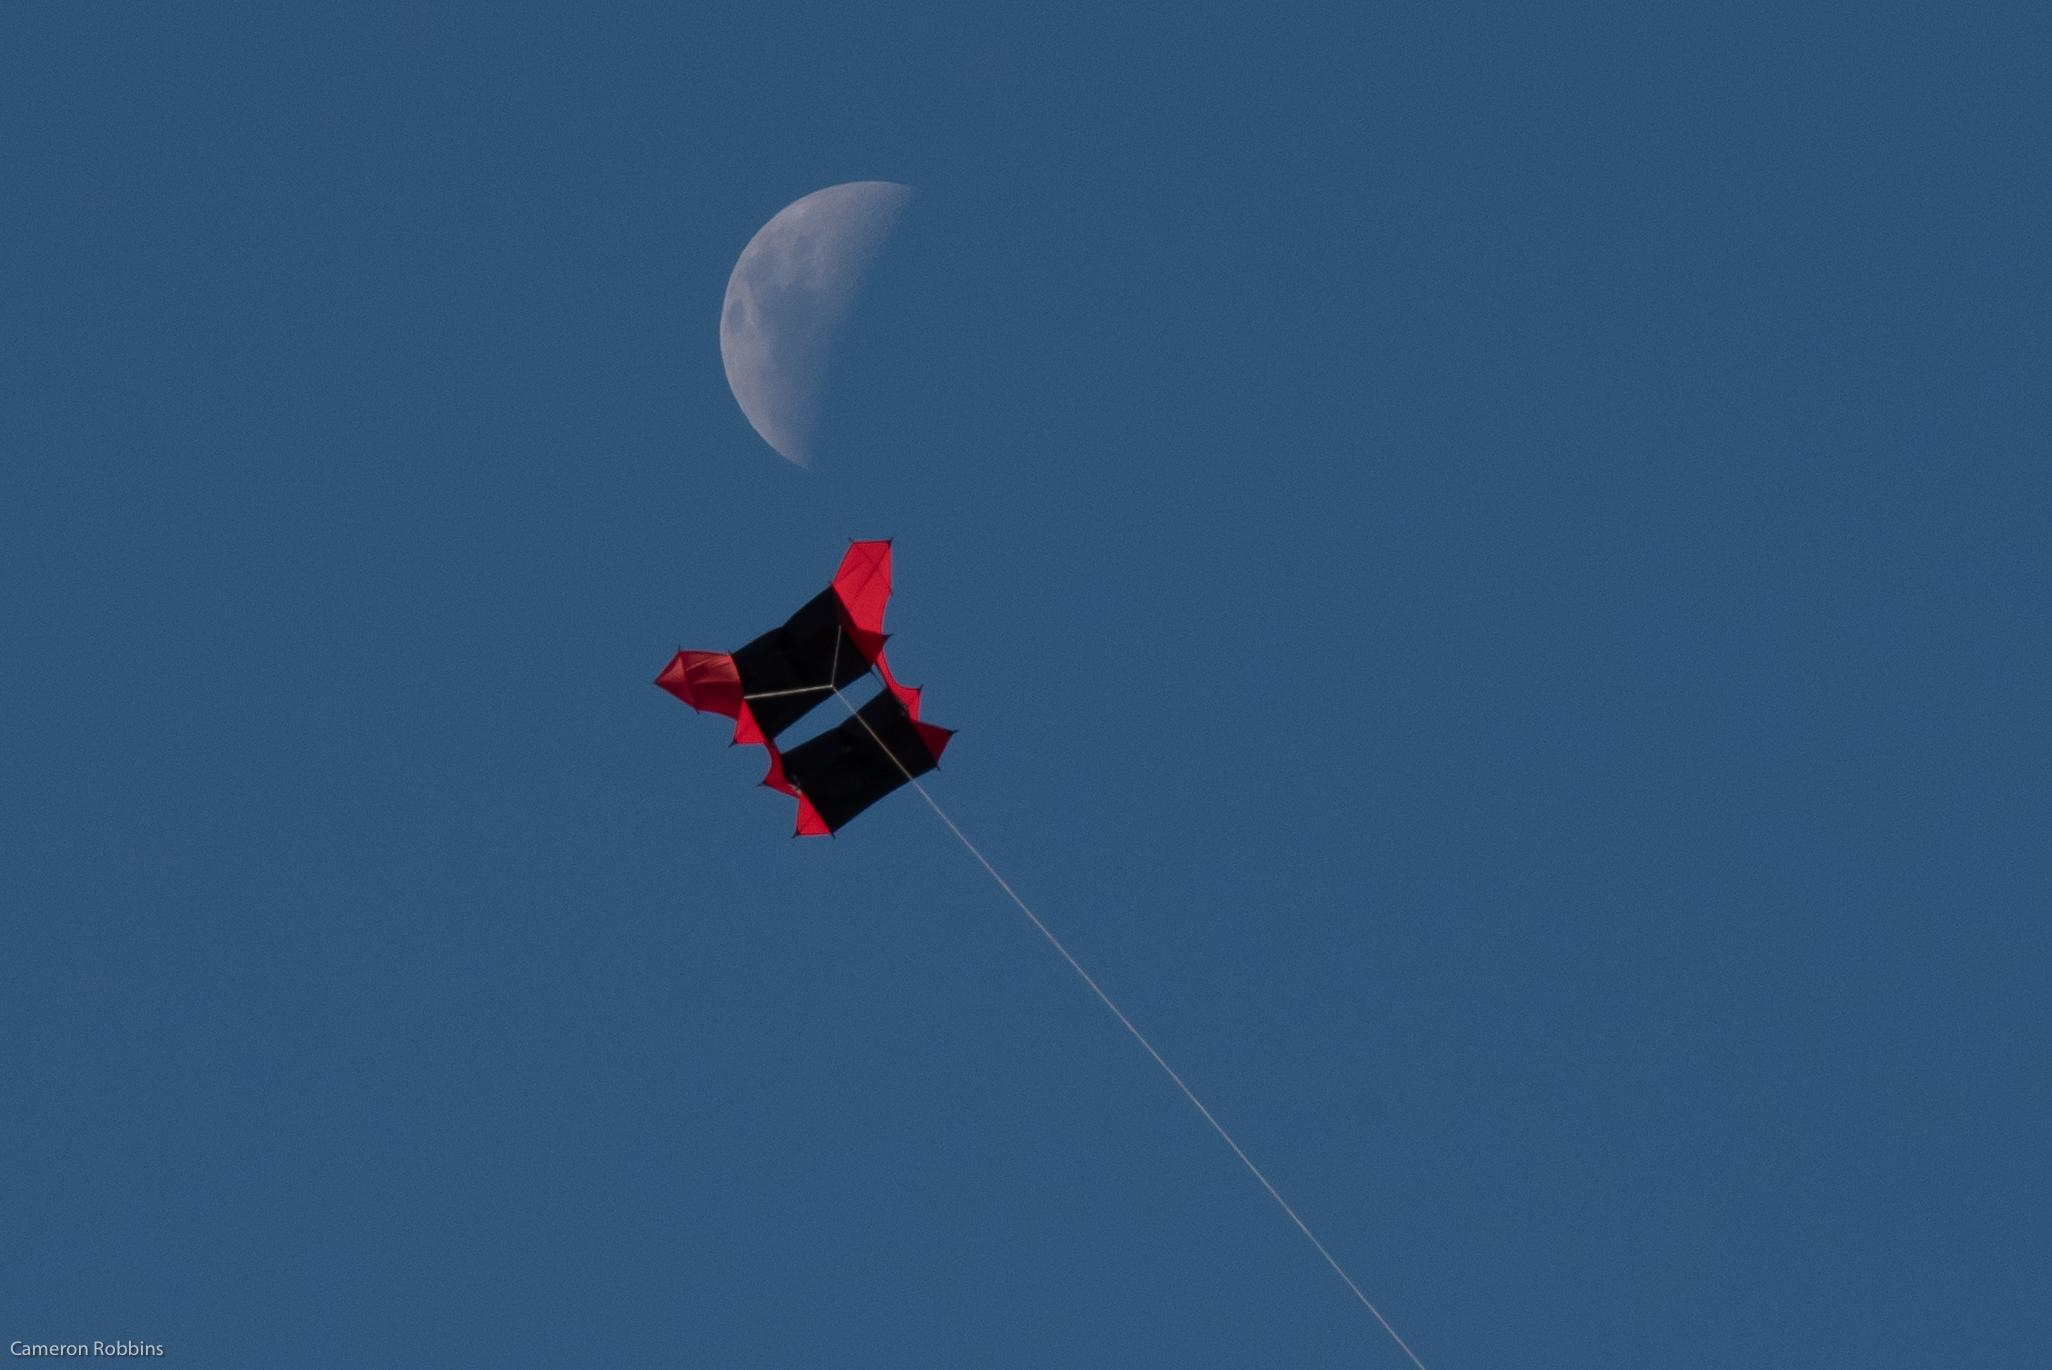 Monmar moon kite<br/>2020, Photographic Inkjet Print on Platine Paper